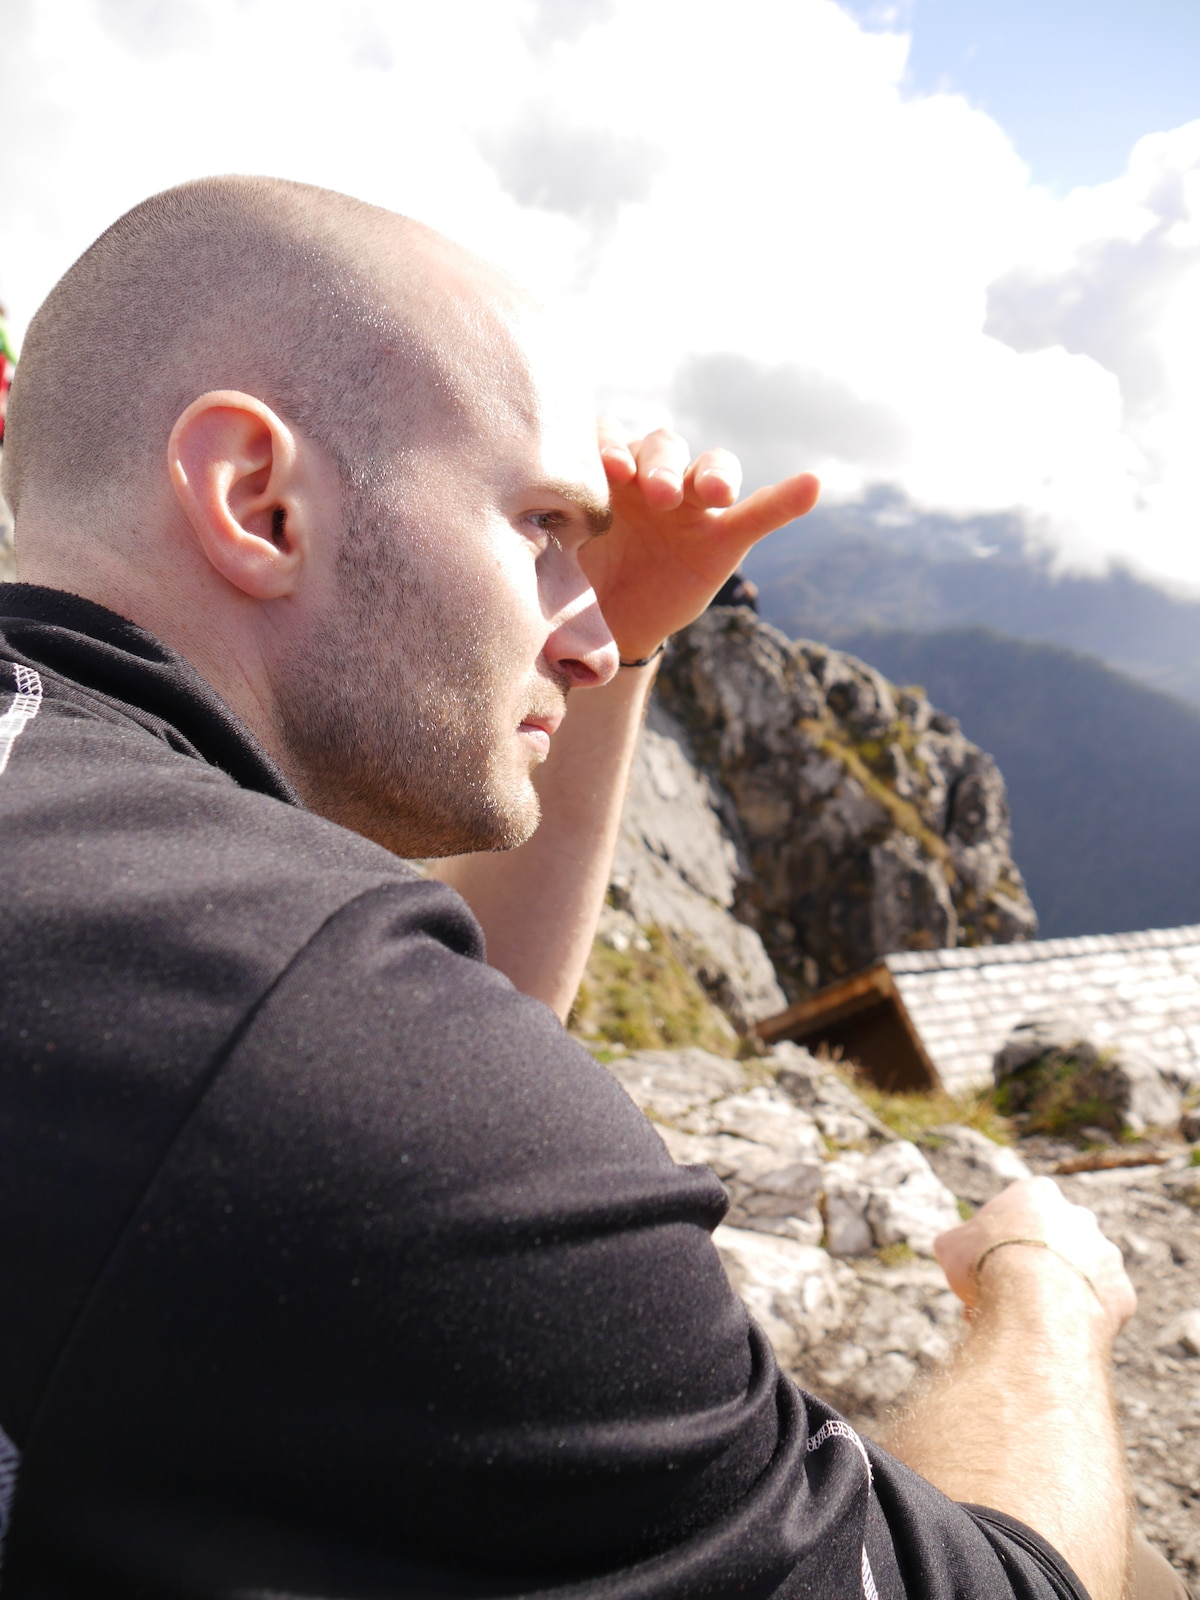 Dieter From Sigmaringen, Germany